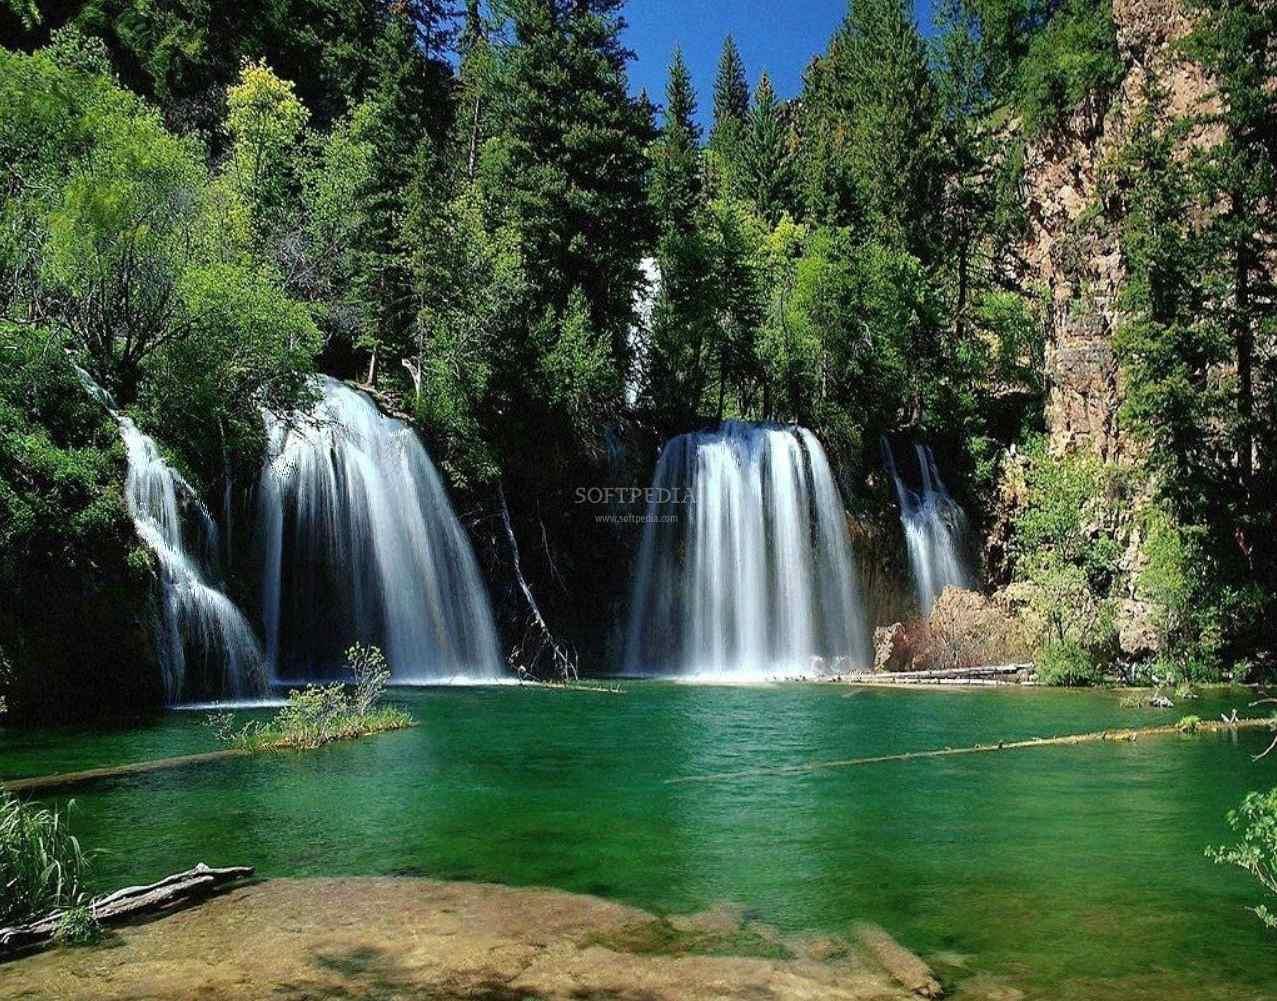 Screensaver wallpaper Download Nature Waterfall Beauty Screensaver 1277x1001